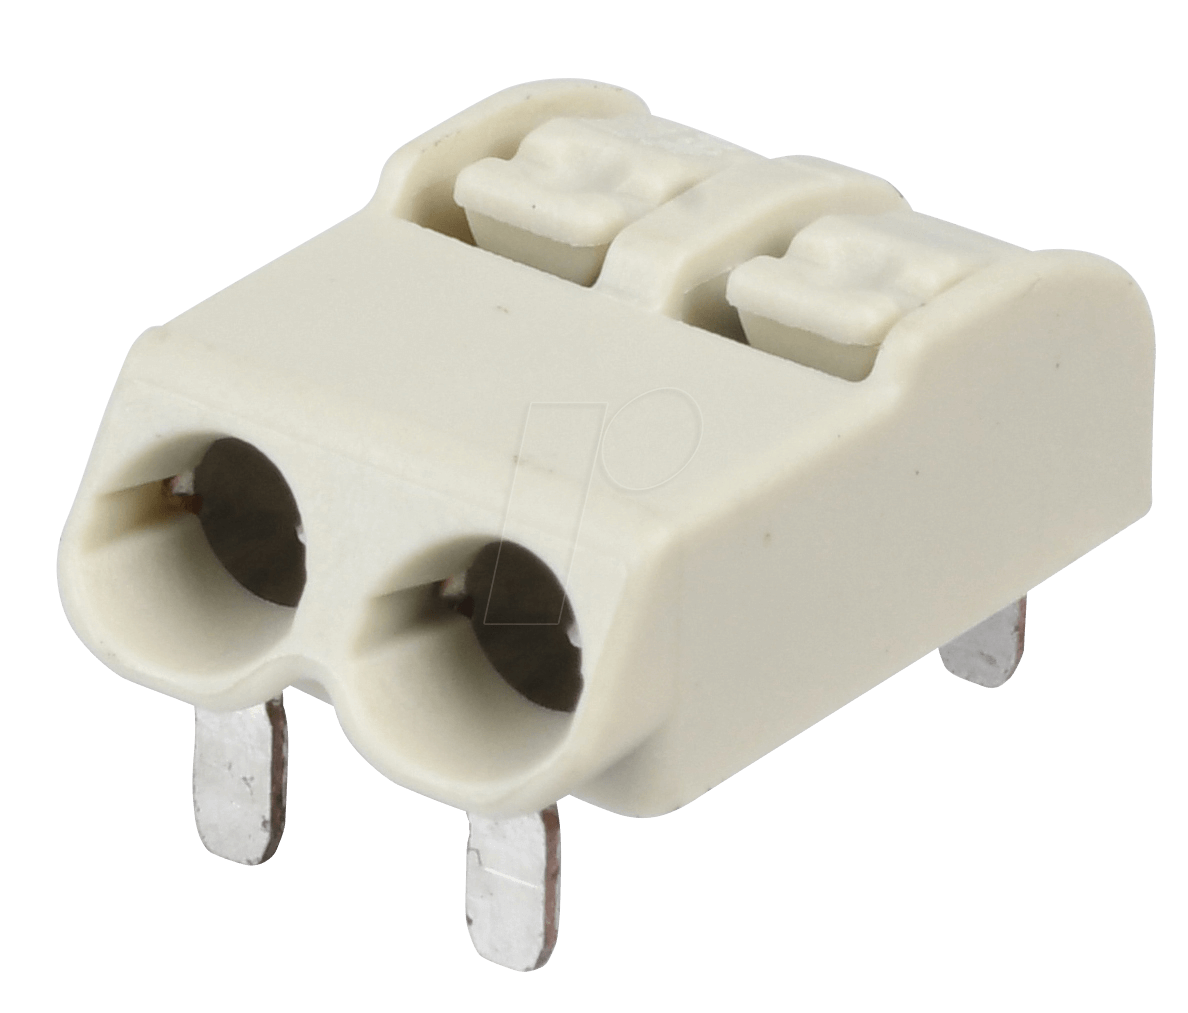 WAGO 2060-1402: THR-pcb-terminal, 2-pole, RM 4 mm, white at reichelt ...